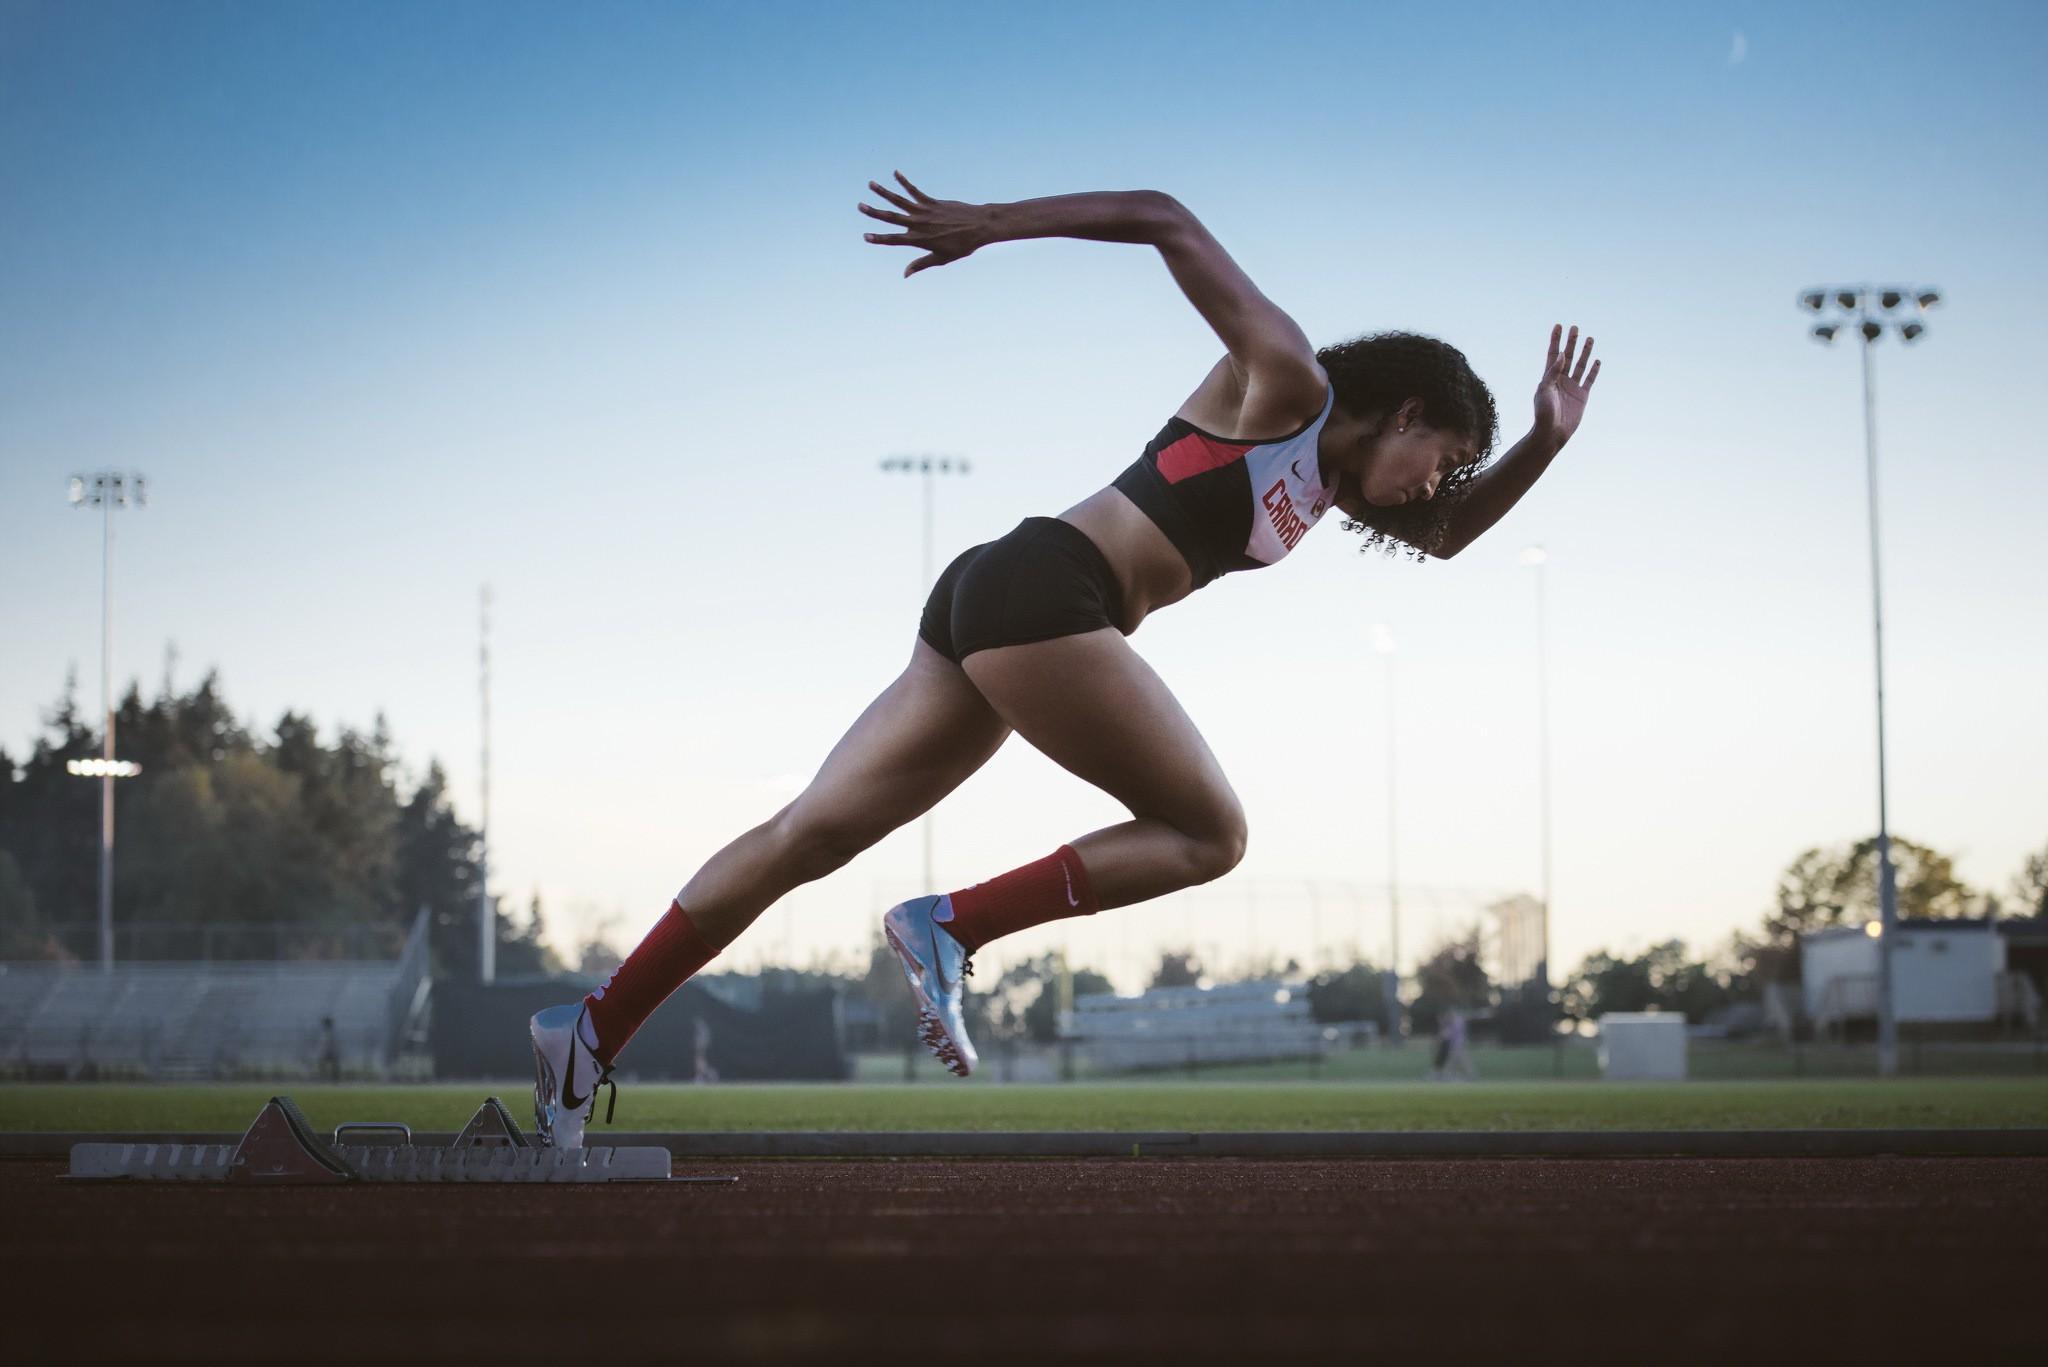 track-girl-runner-wide-wallpaper-hd-60126-61921-hd-wallpapers.jpg